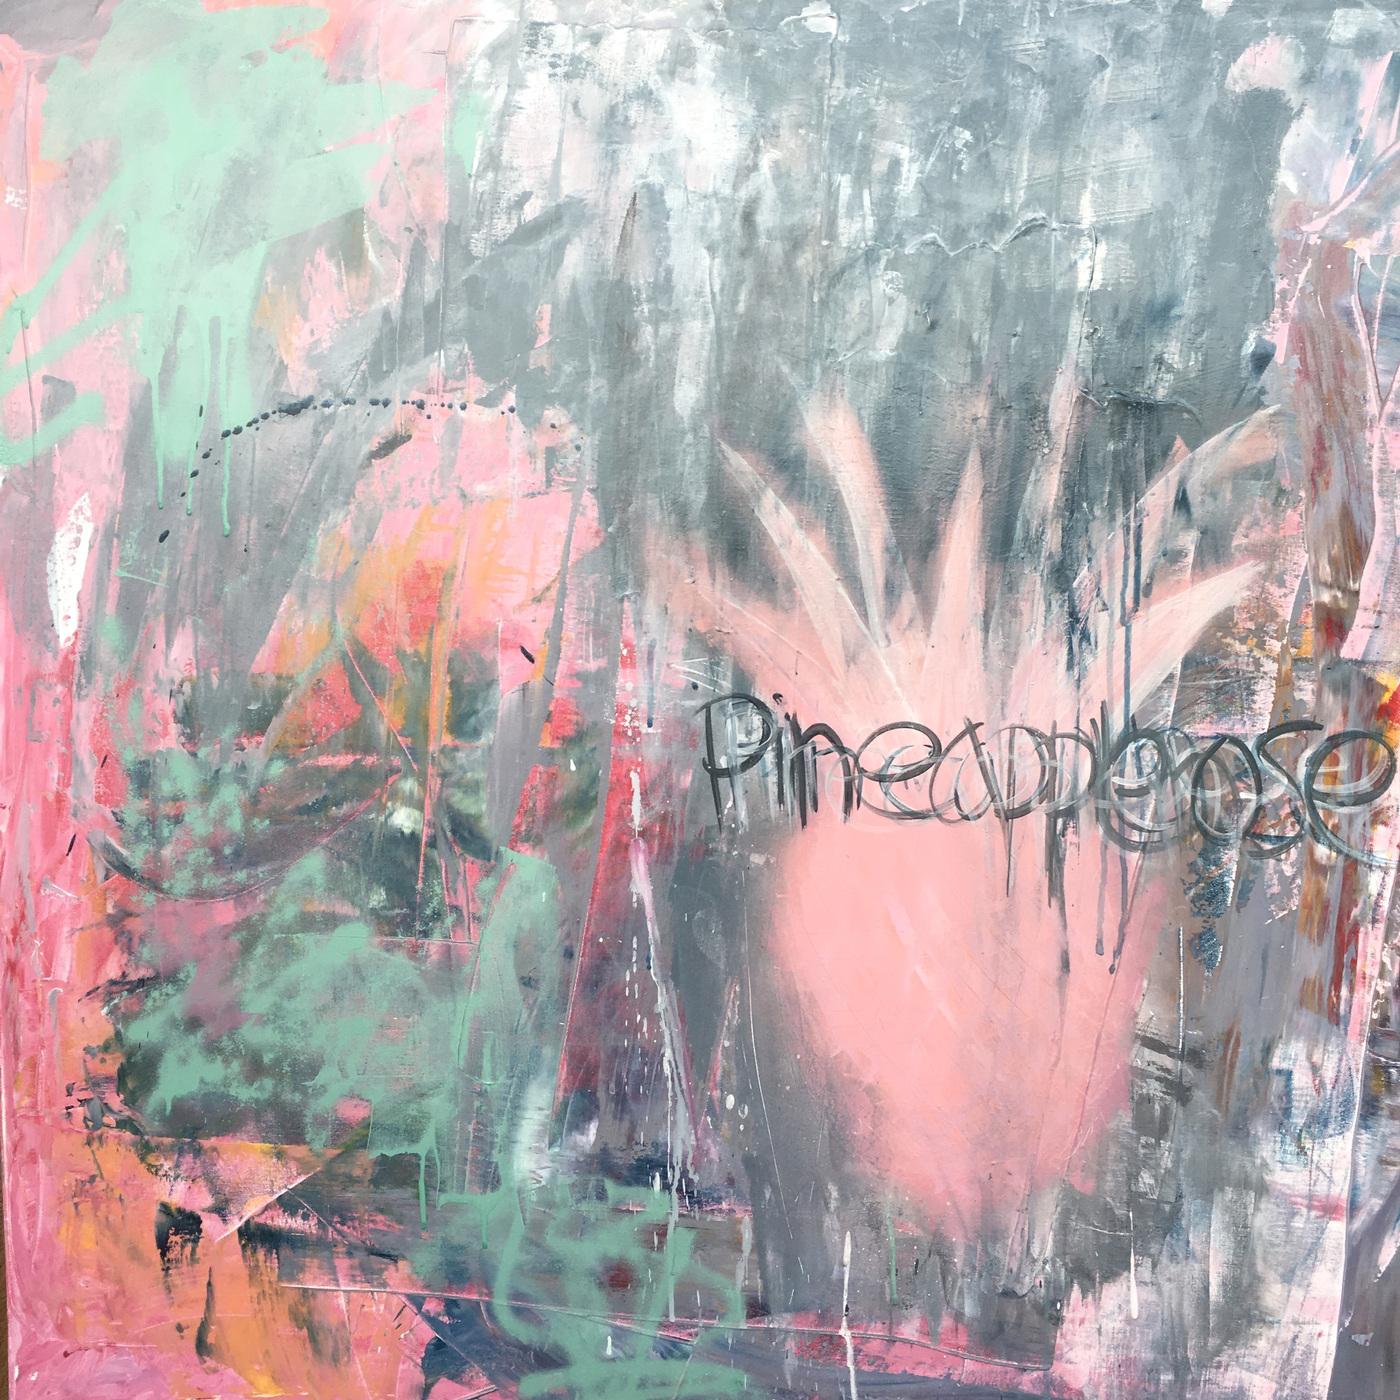 Alexander Ekman Sinclair - ART - PineappleNose